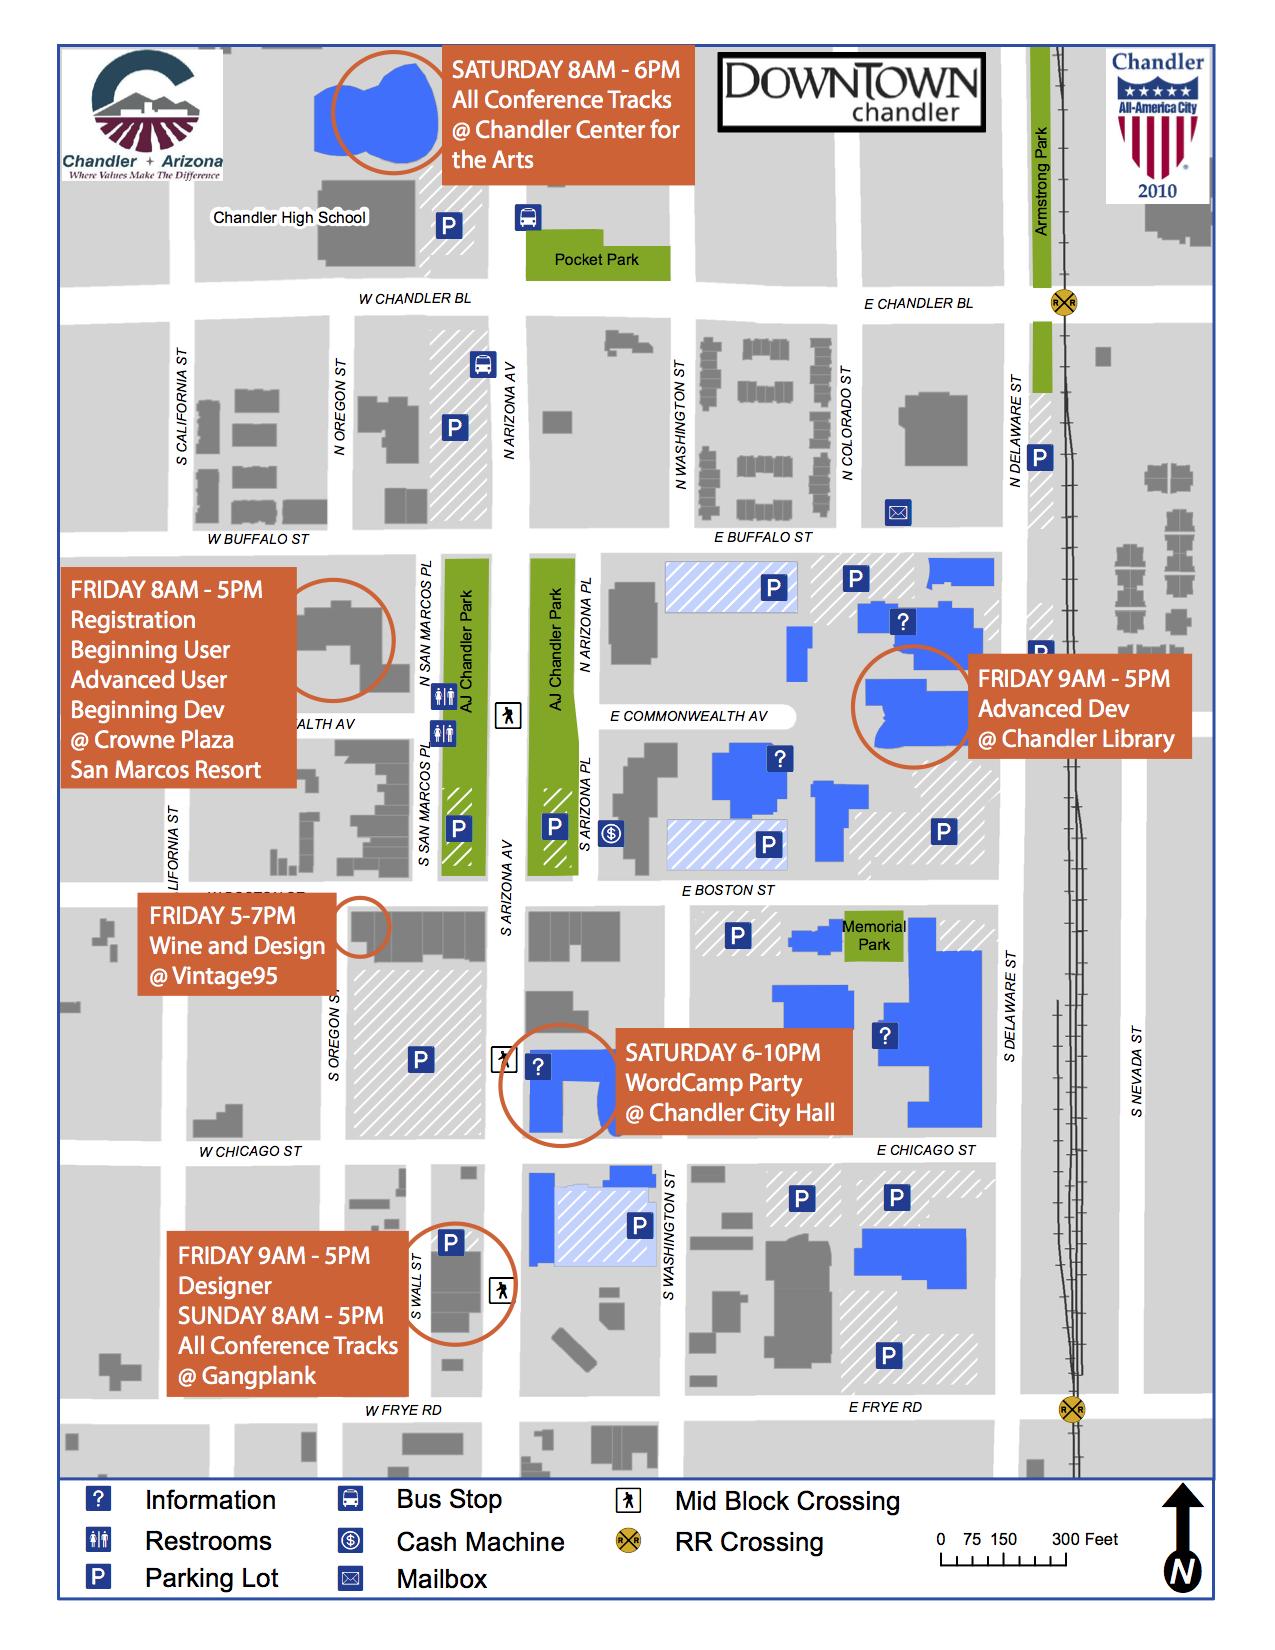 WordCamp Phoenix 2014 - Map of Chandler, AZ